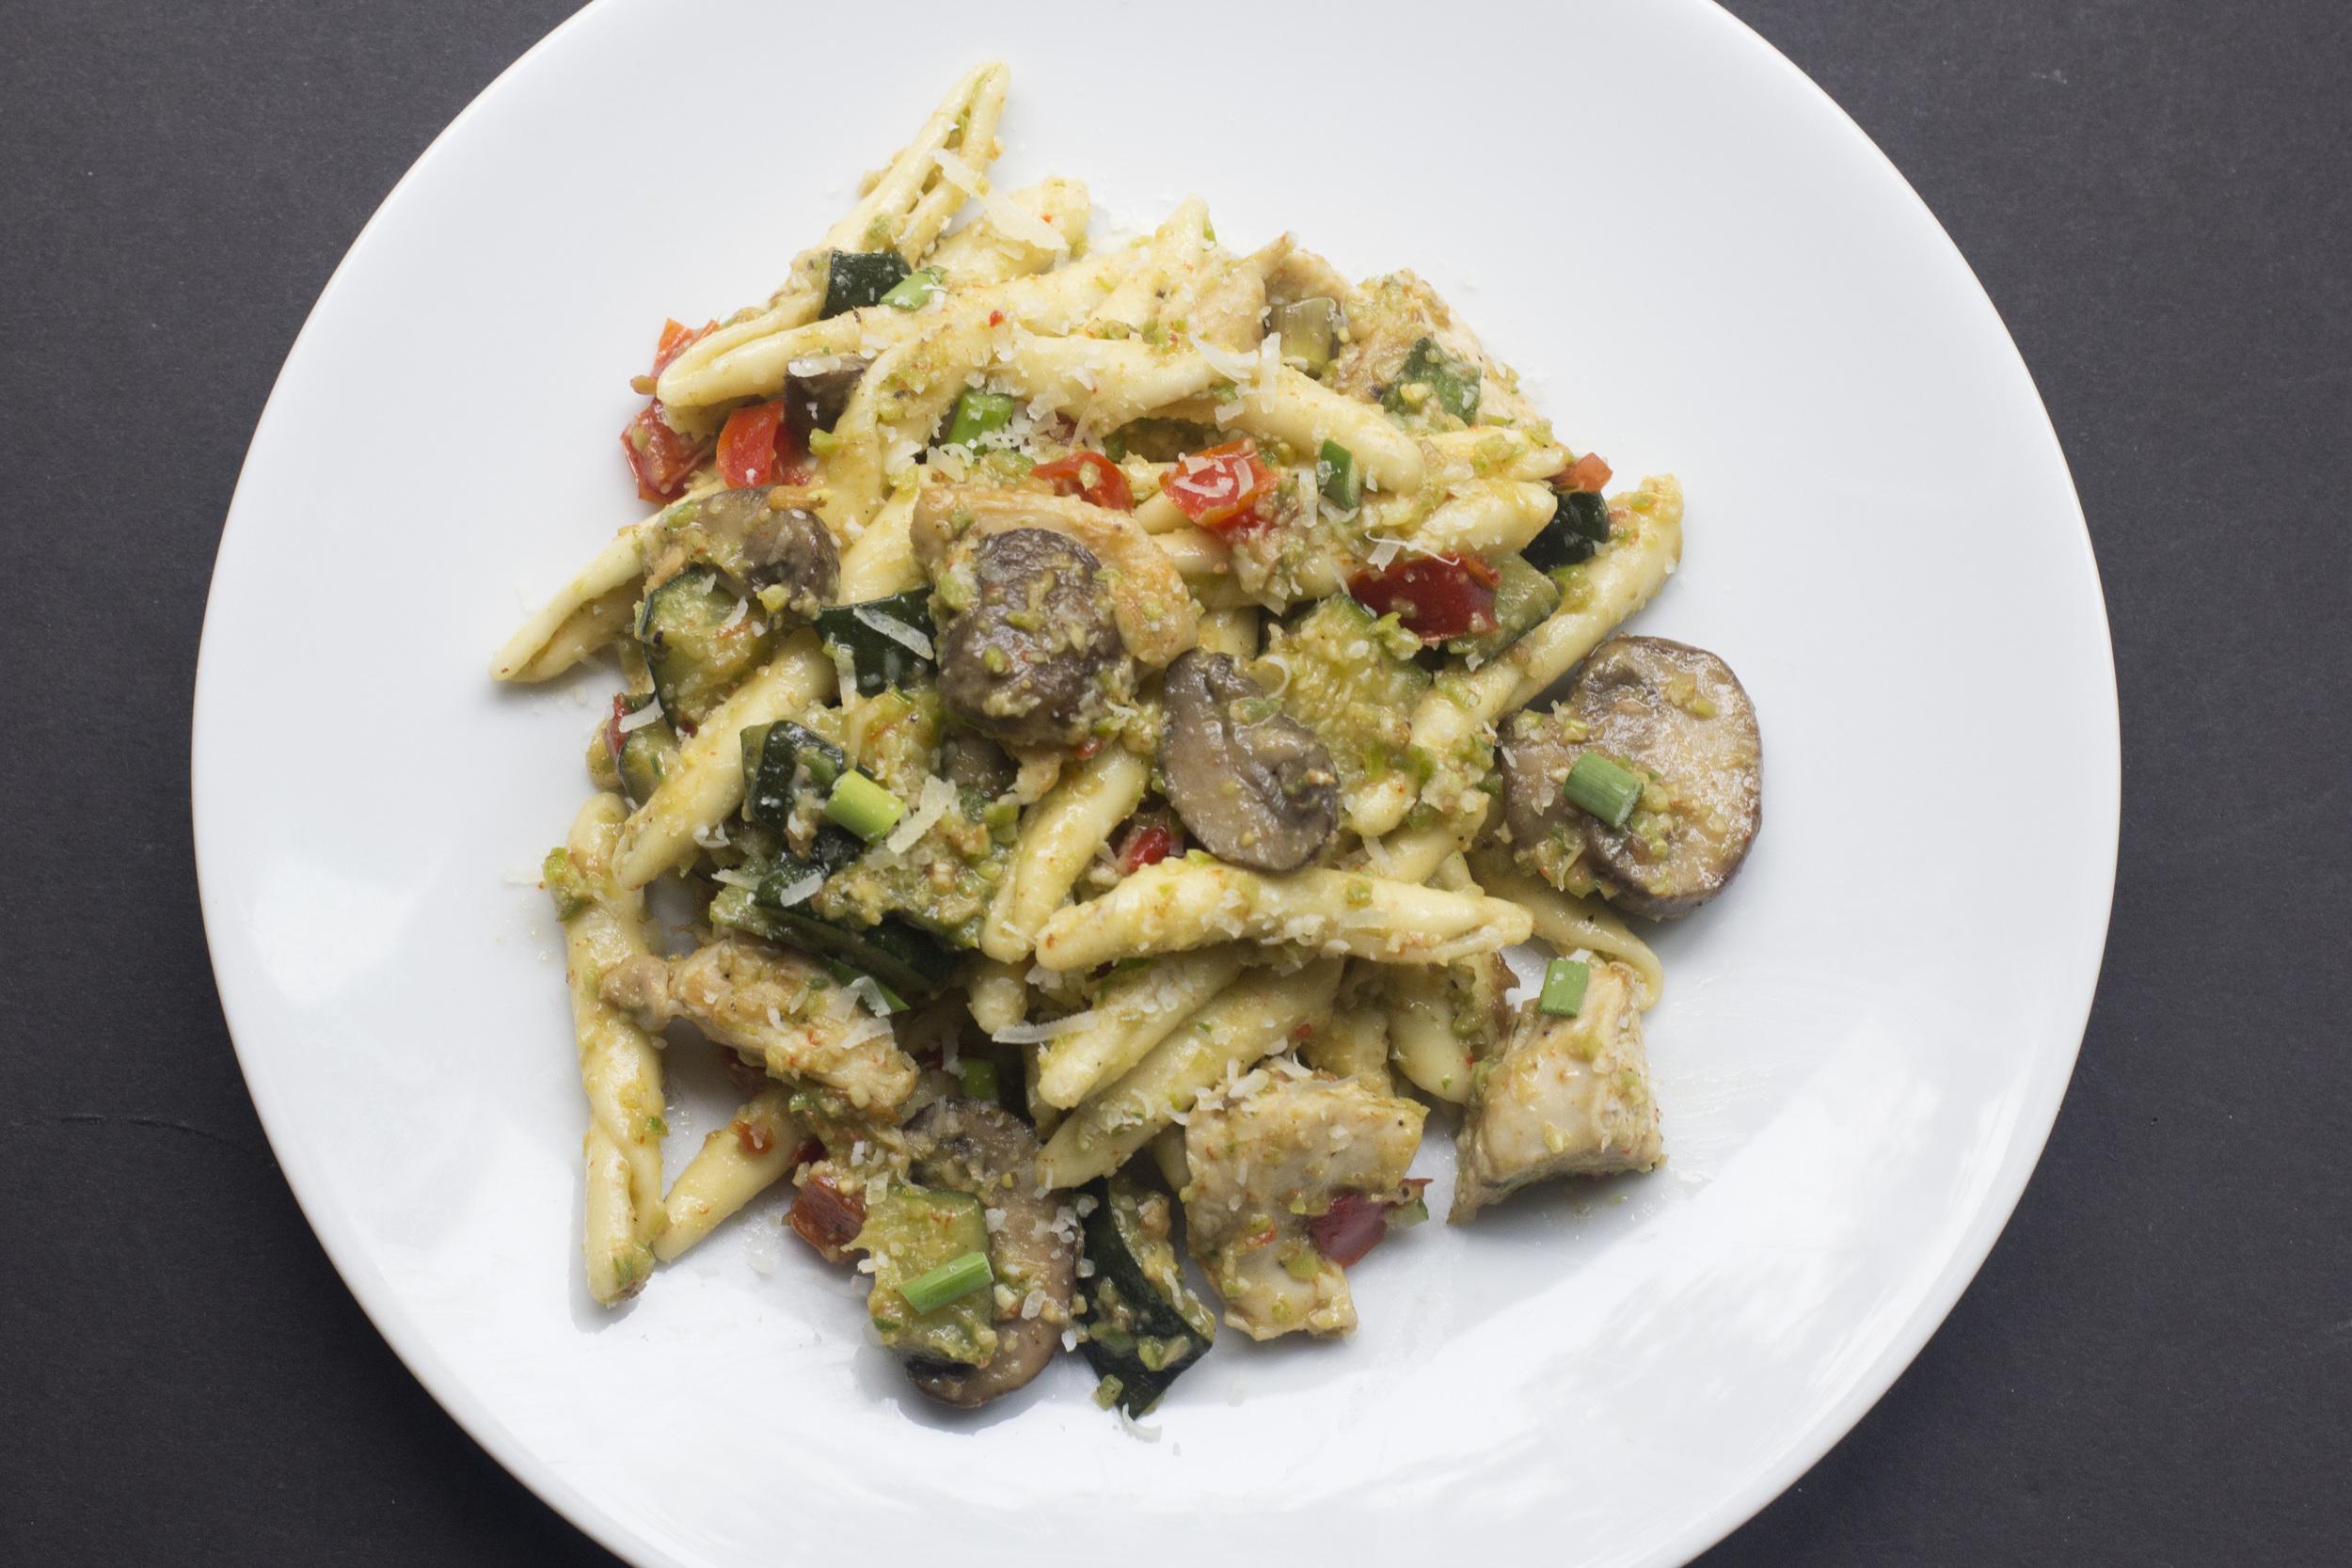 fusilli with sautéed chicken breast, mushrooms, red pepper, and zucchini, tossed in garlic scape pesto